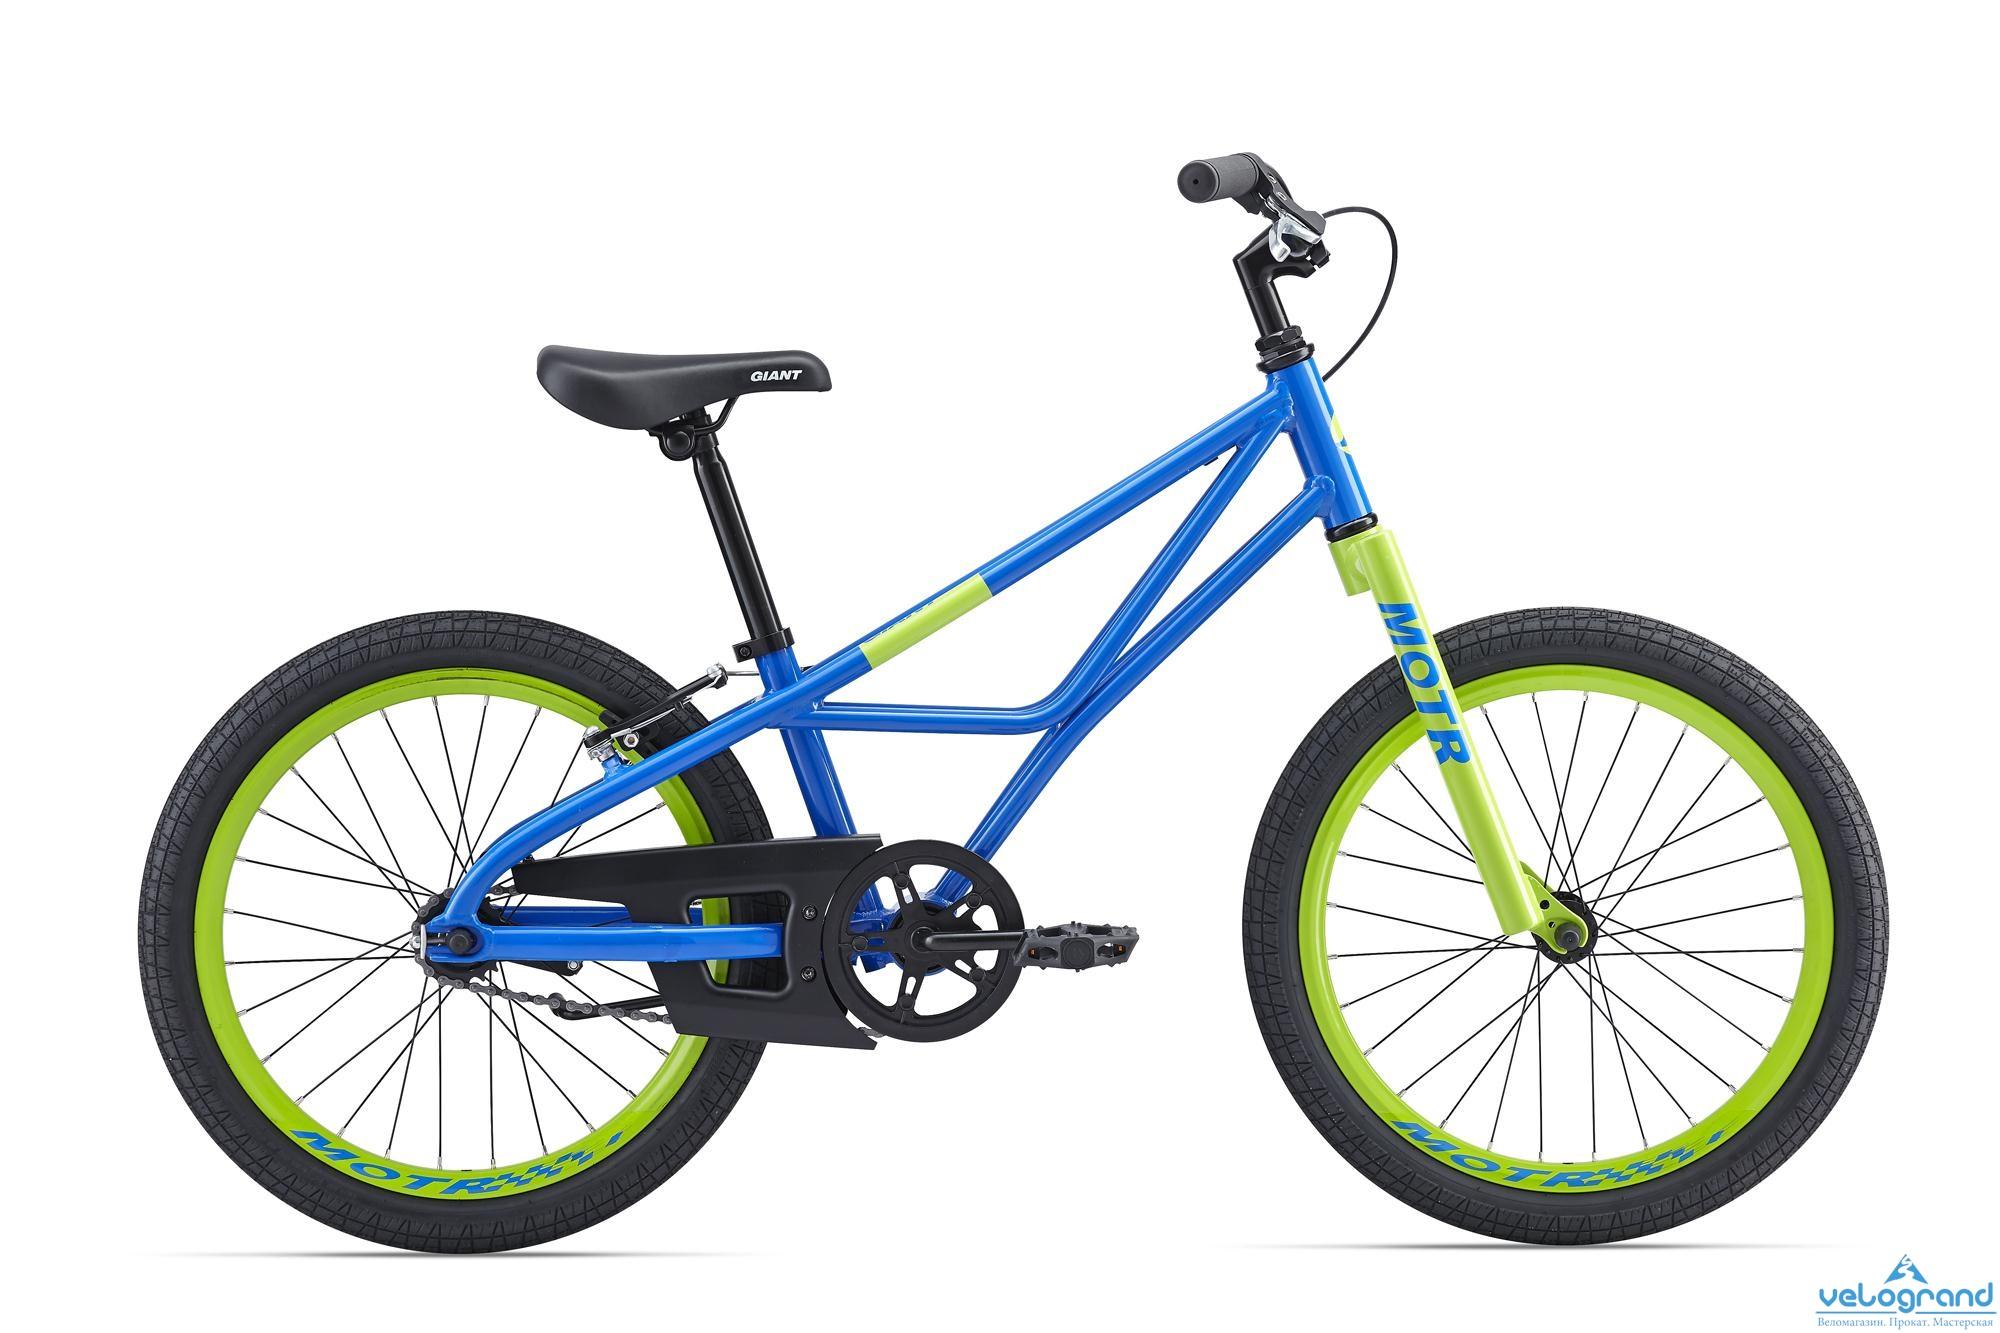 Детский велосипед Giant Motr C/B 20 (2016) от Velogrand